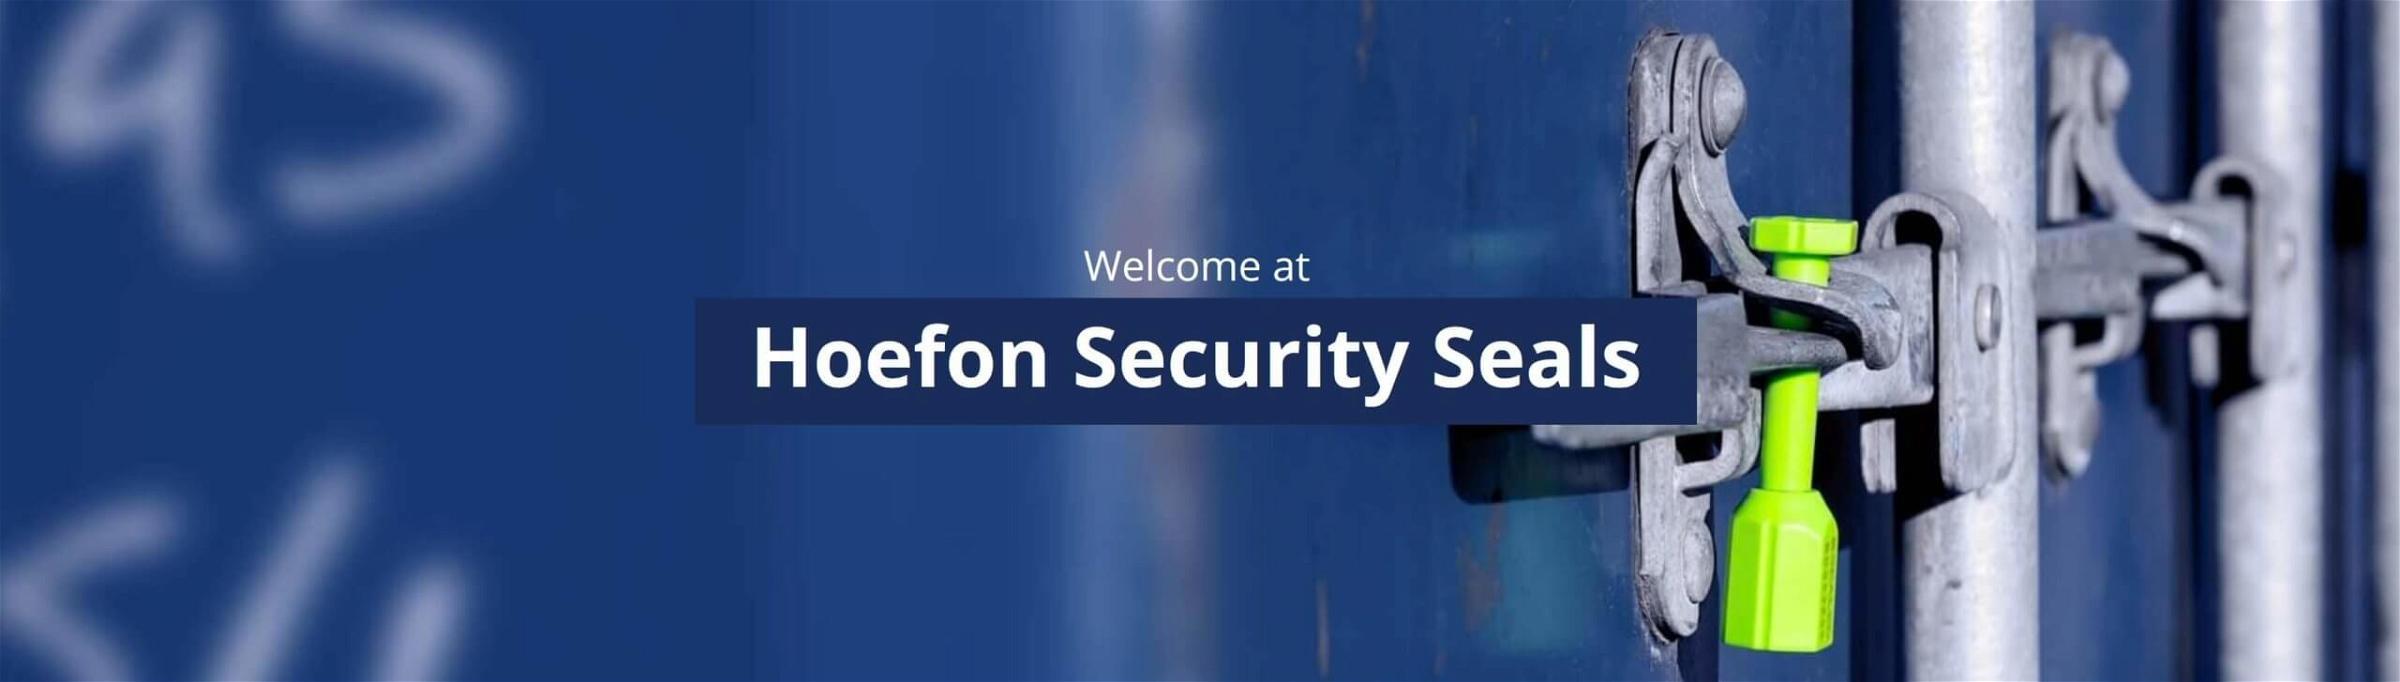 Hoefon Security Seals